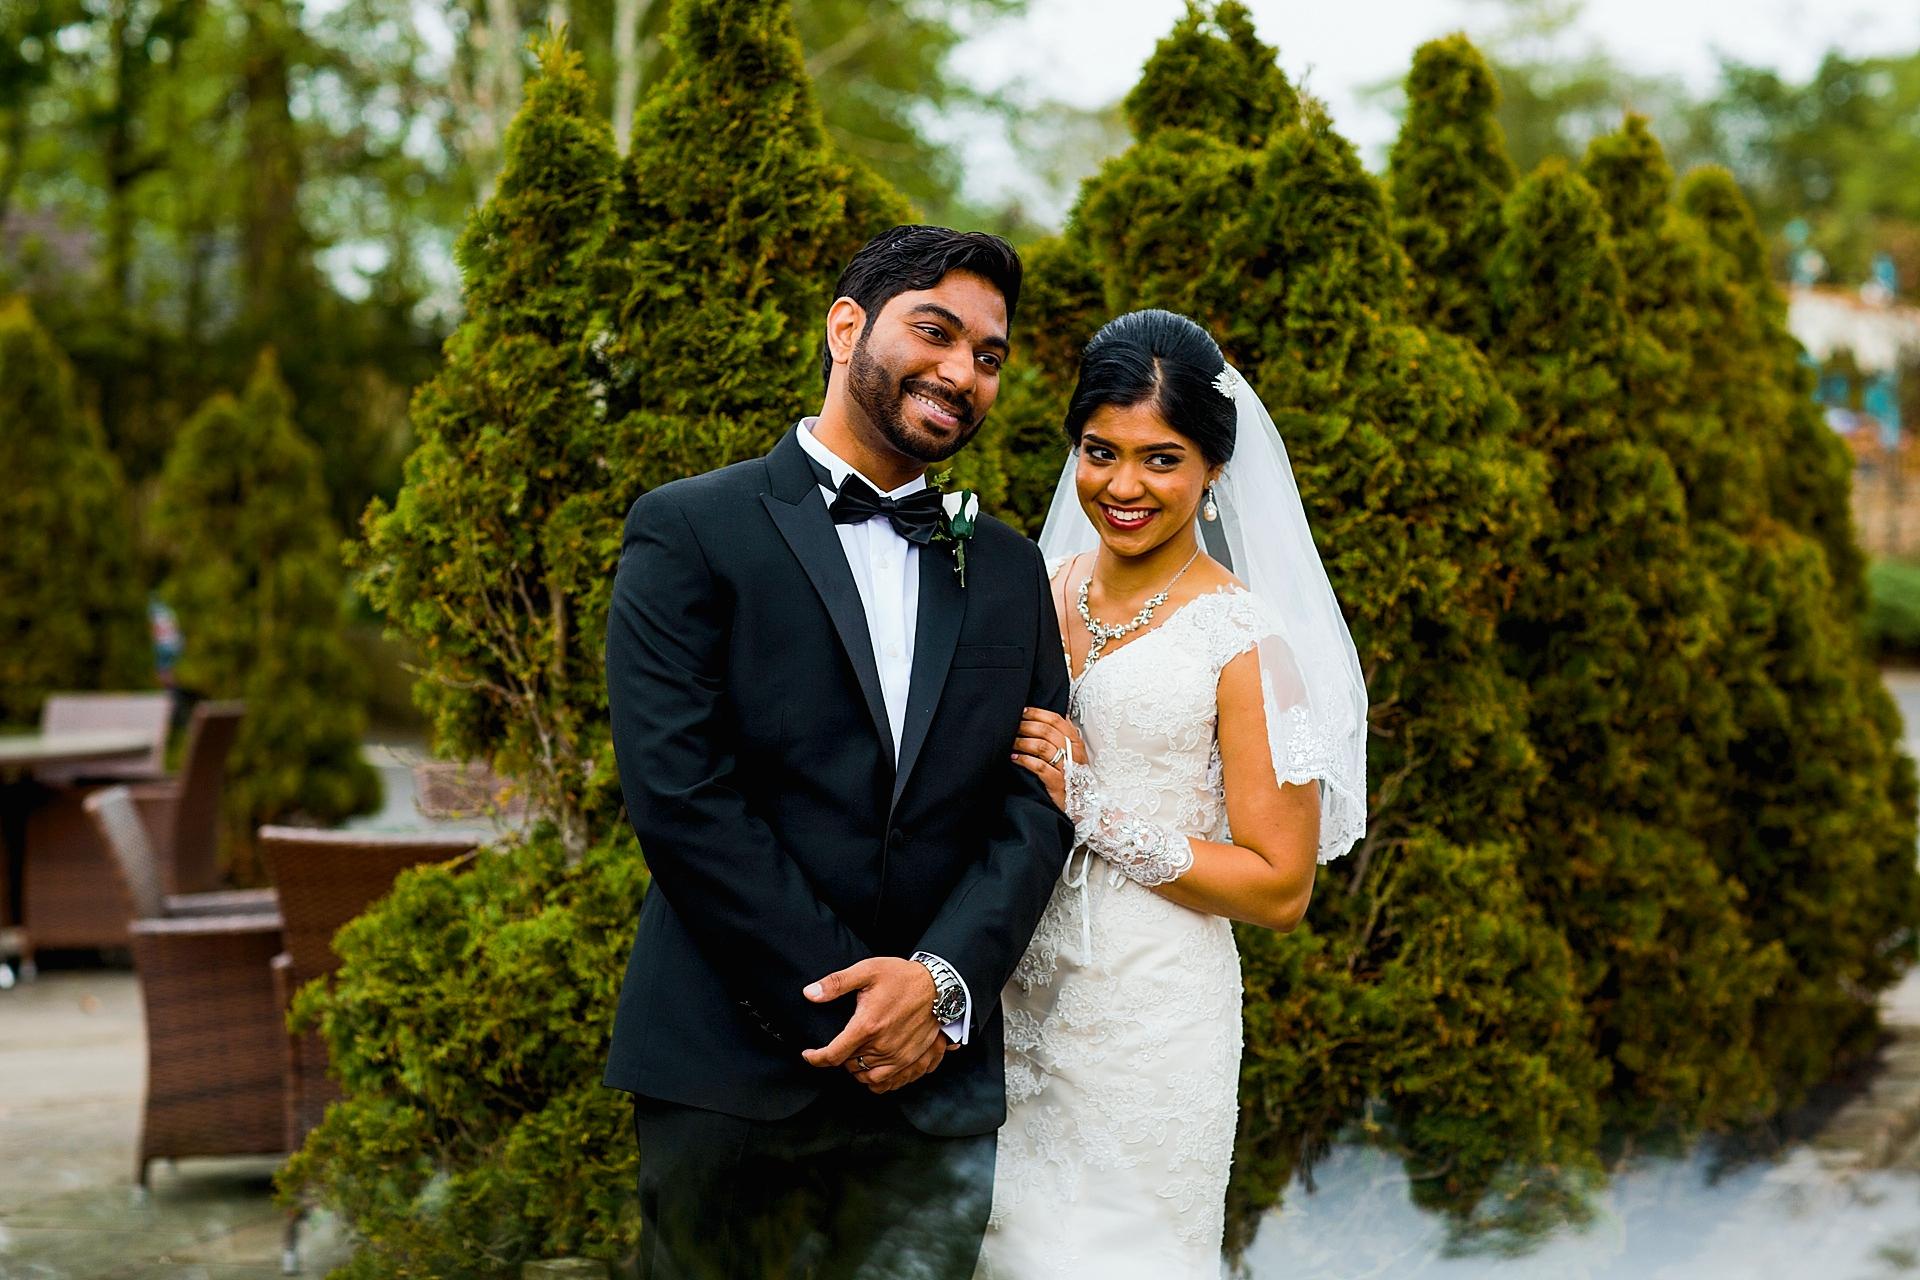 Award winning Indian wedding preston Lancashire photography